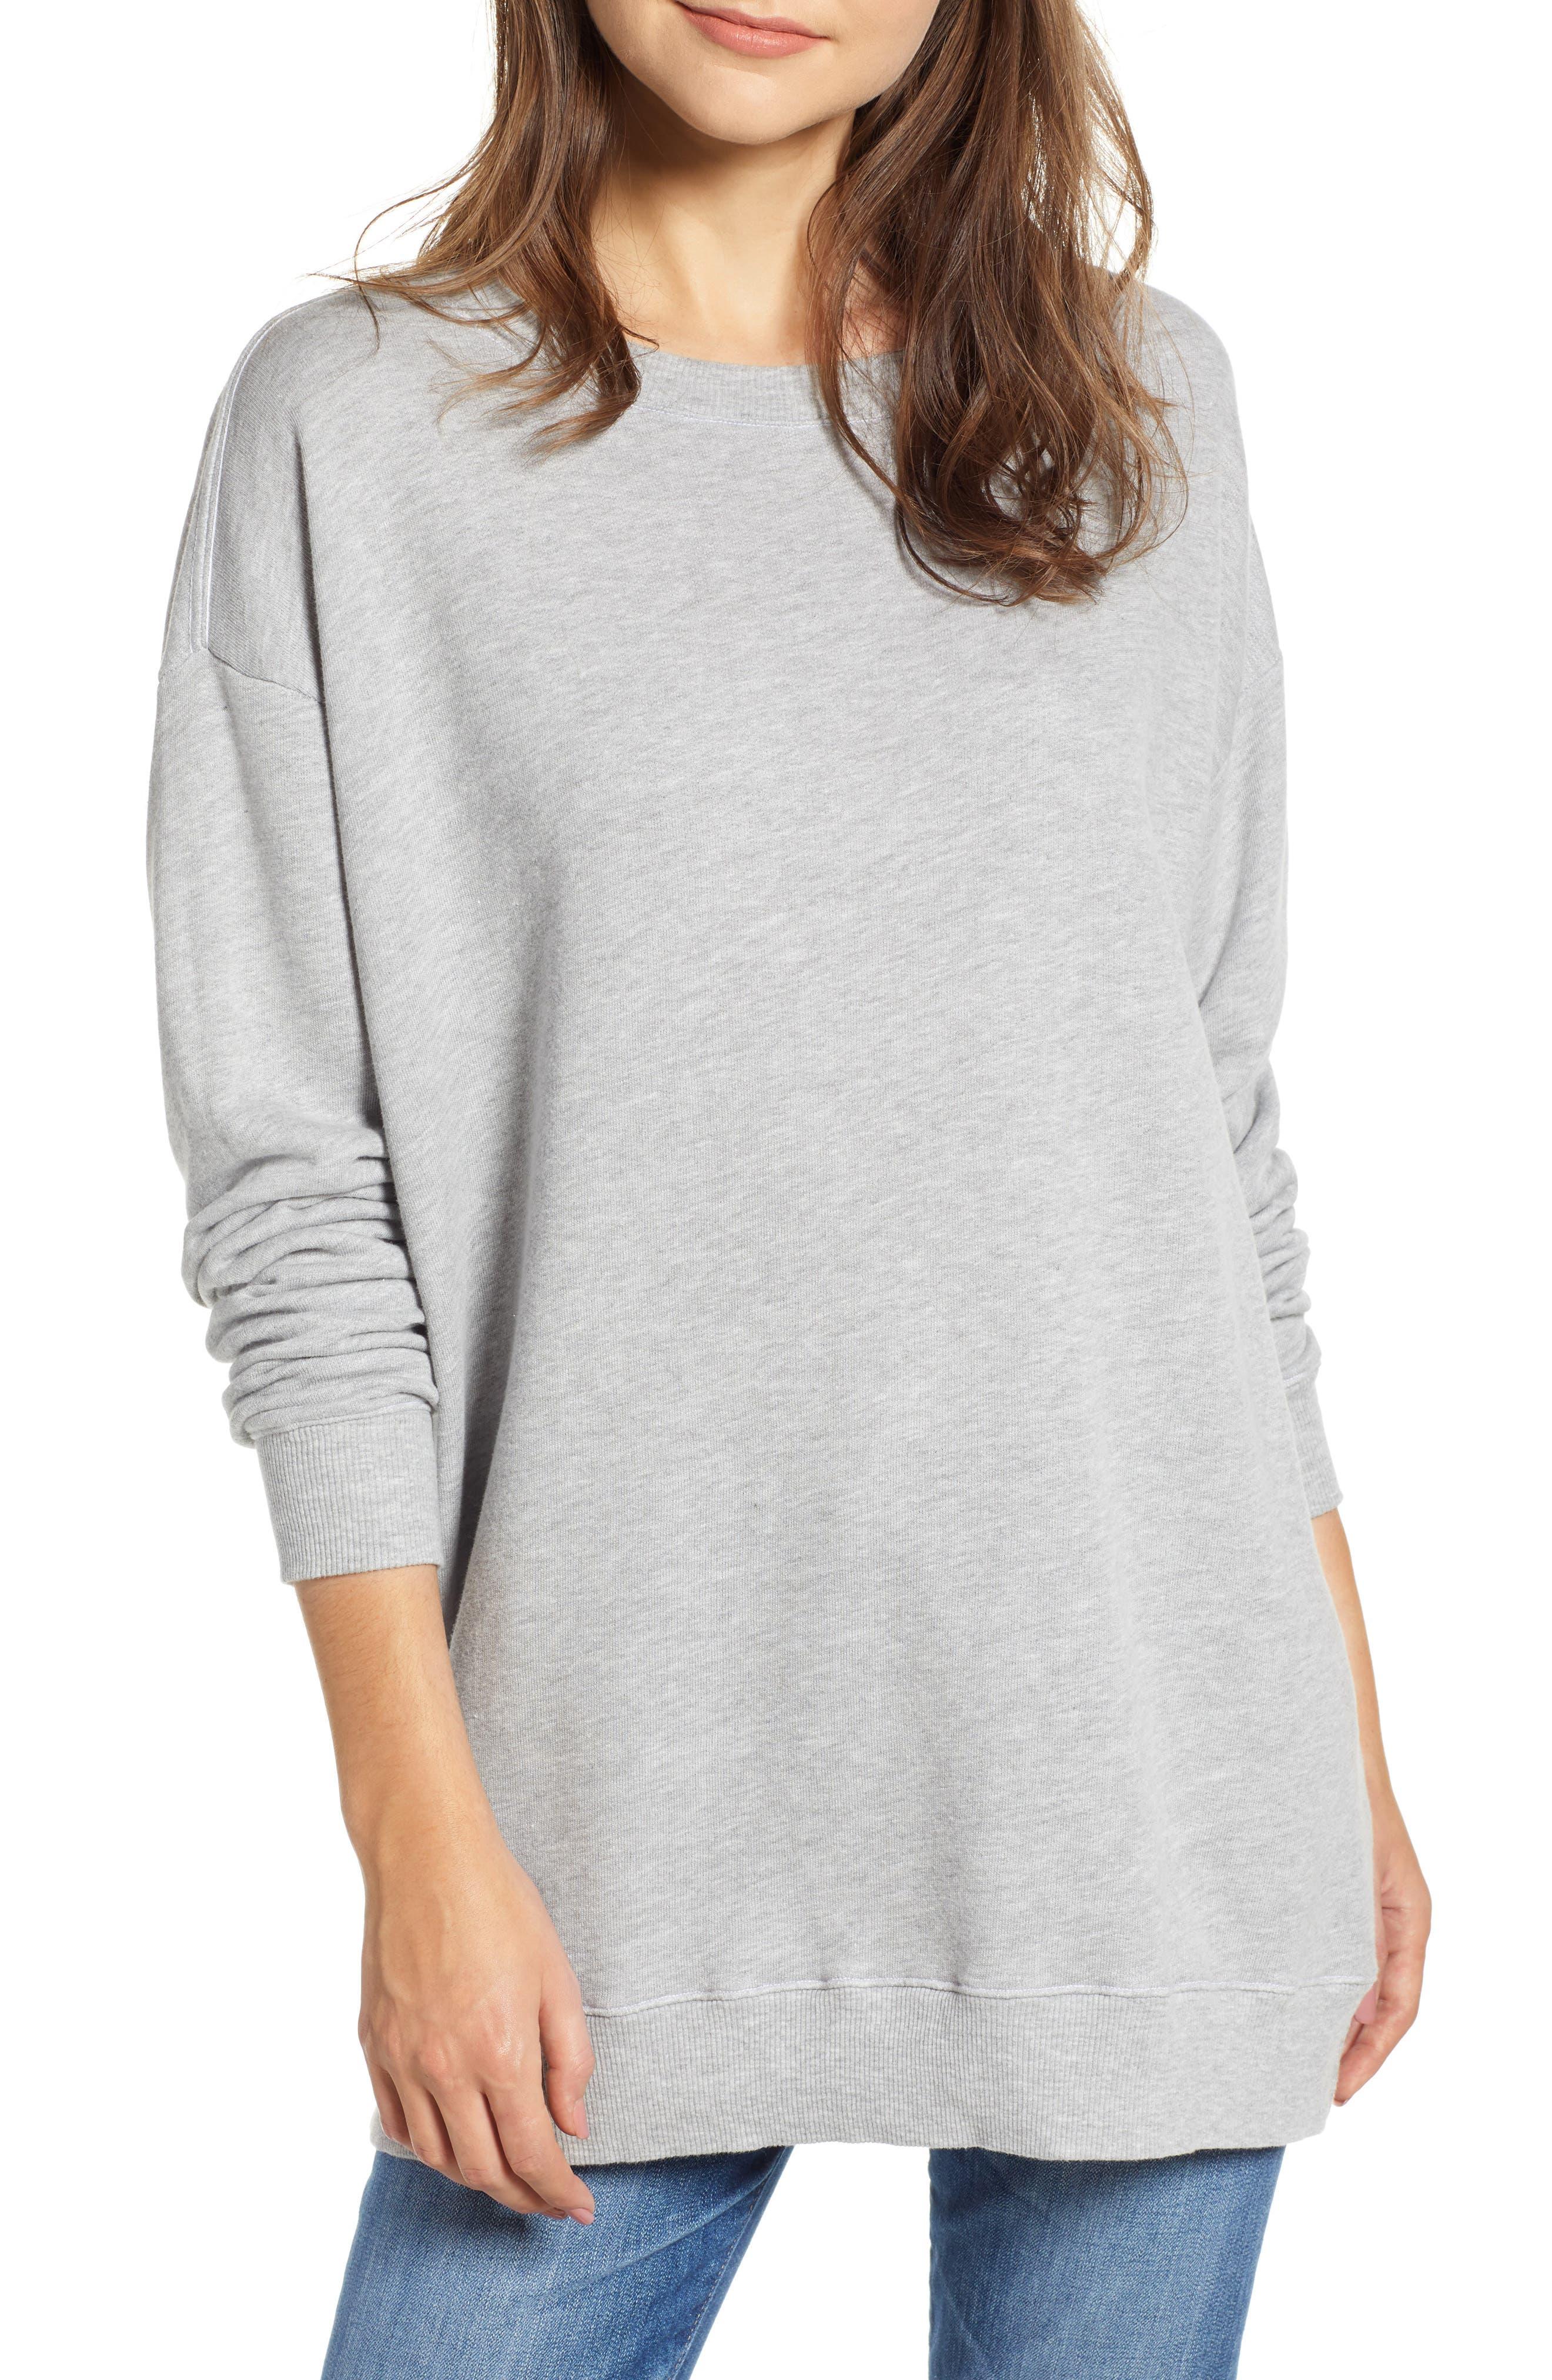 Roadtrip Sweatshirt,                         Main,                         color, HEATHER